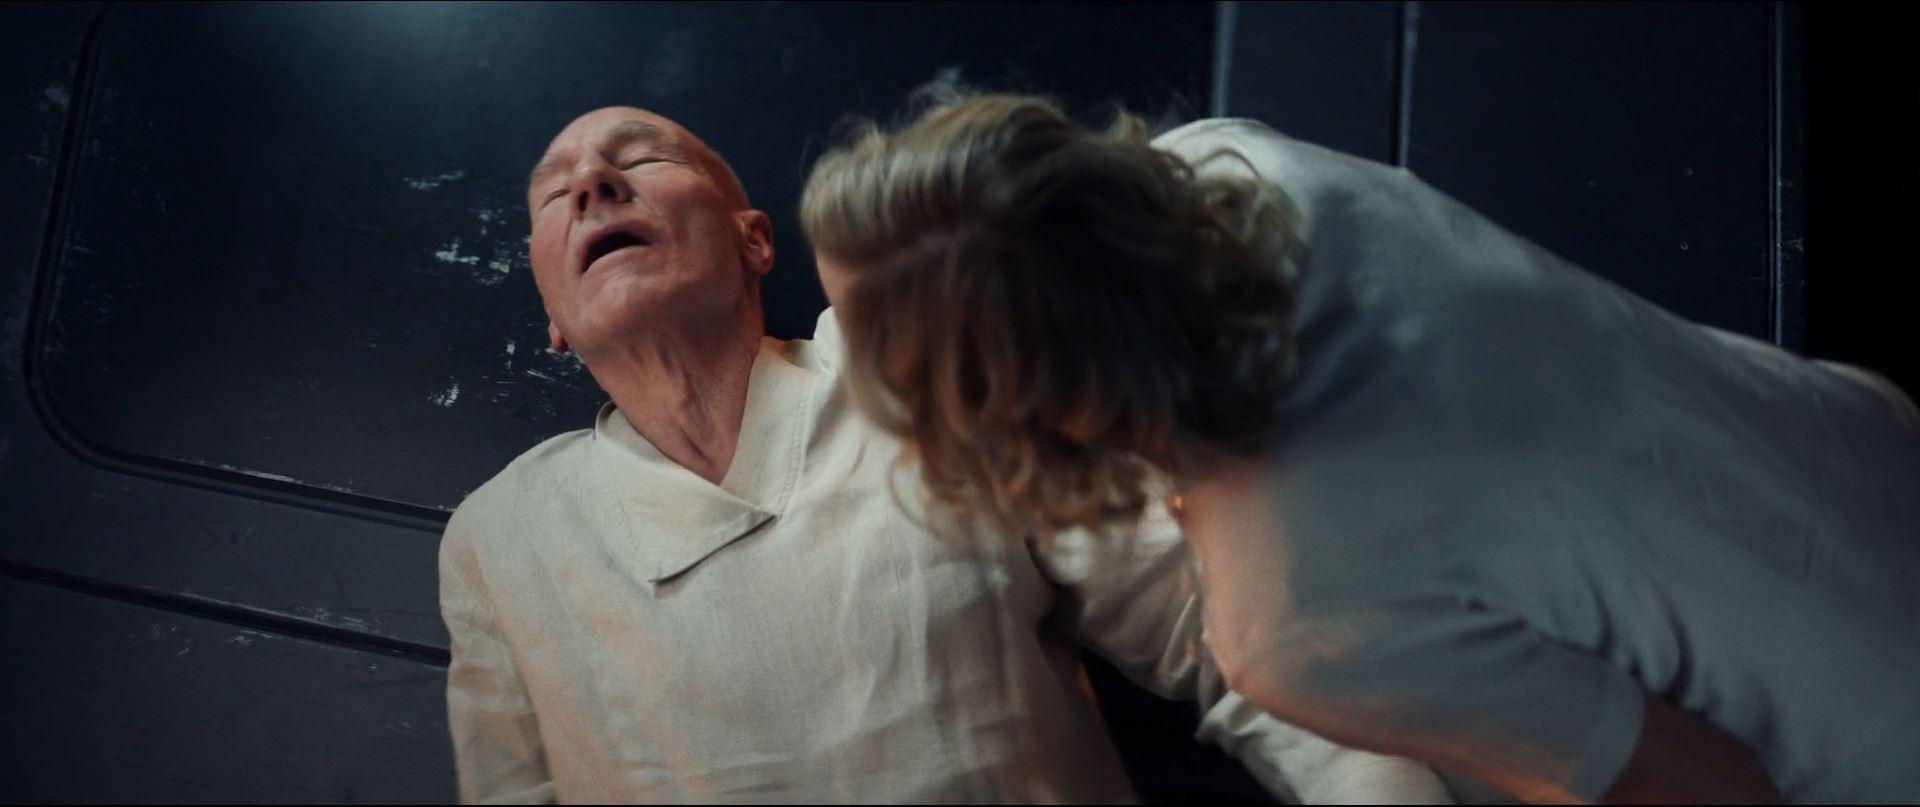 Star Trek Picard S01E10 Et in Arcadia Ego Part 2 Review - Picard dies